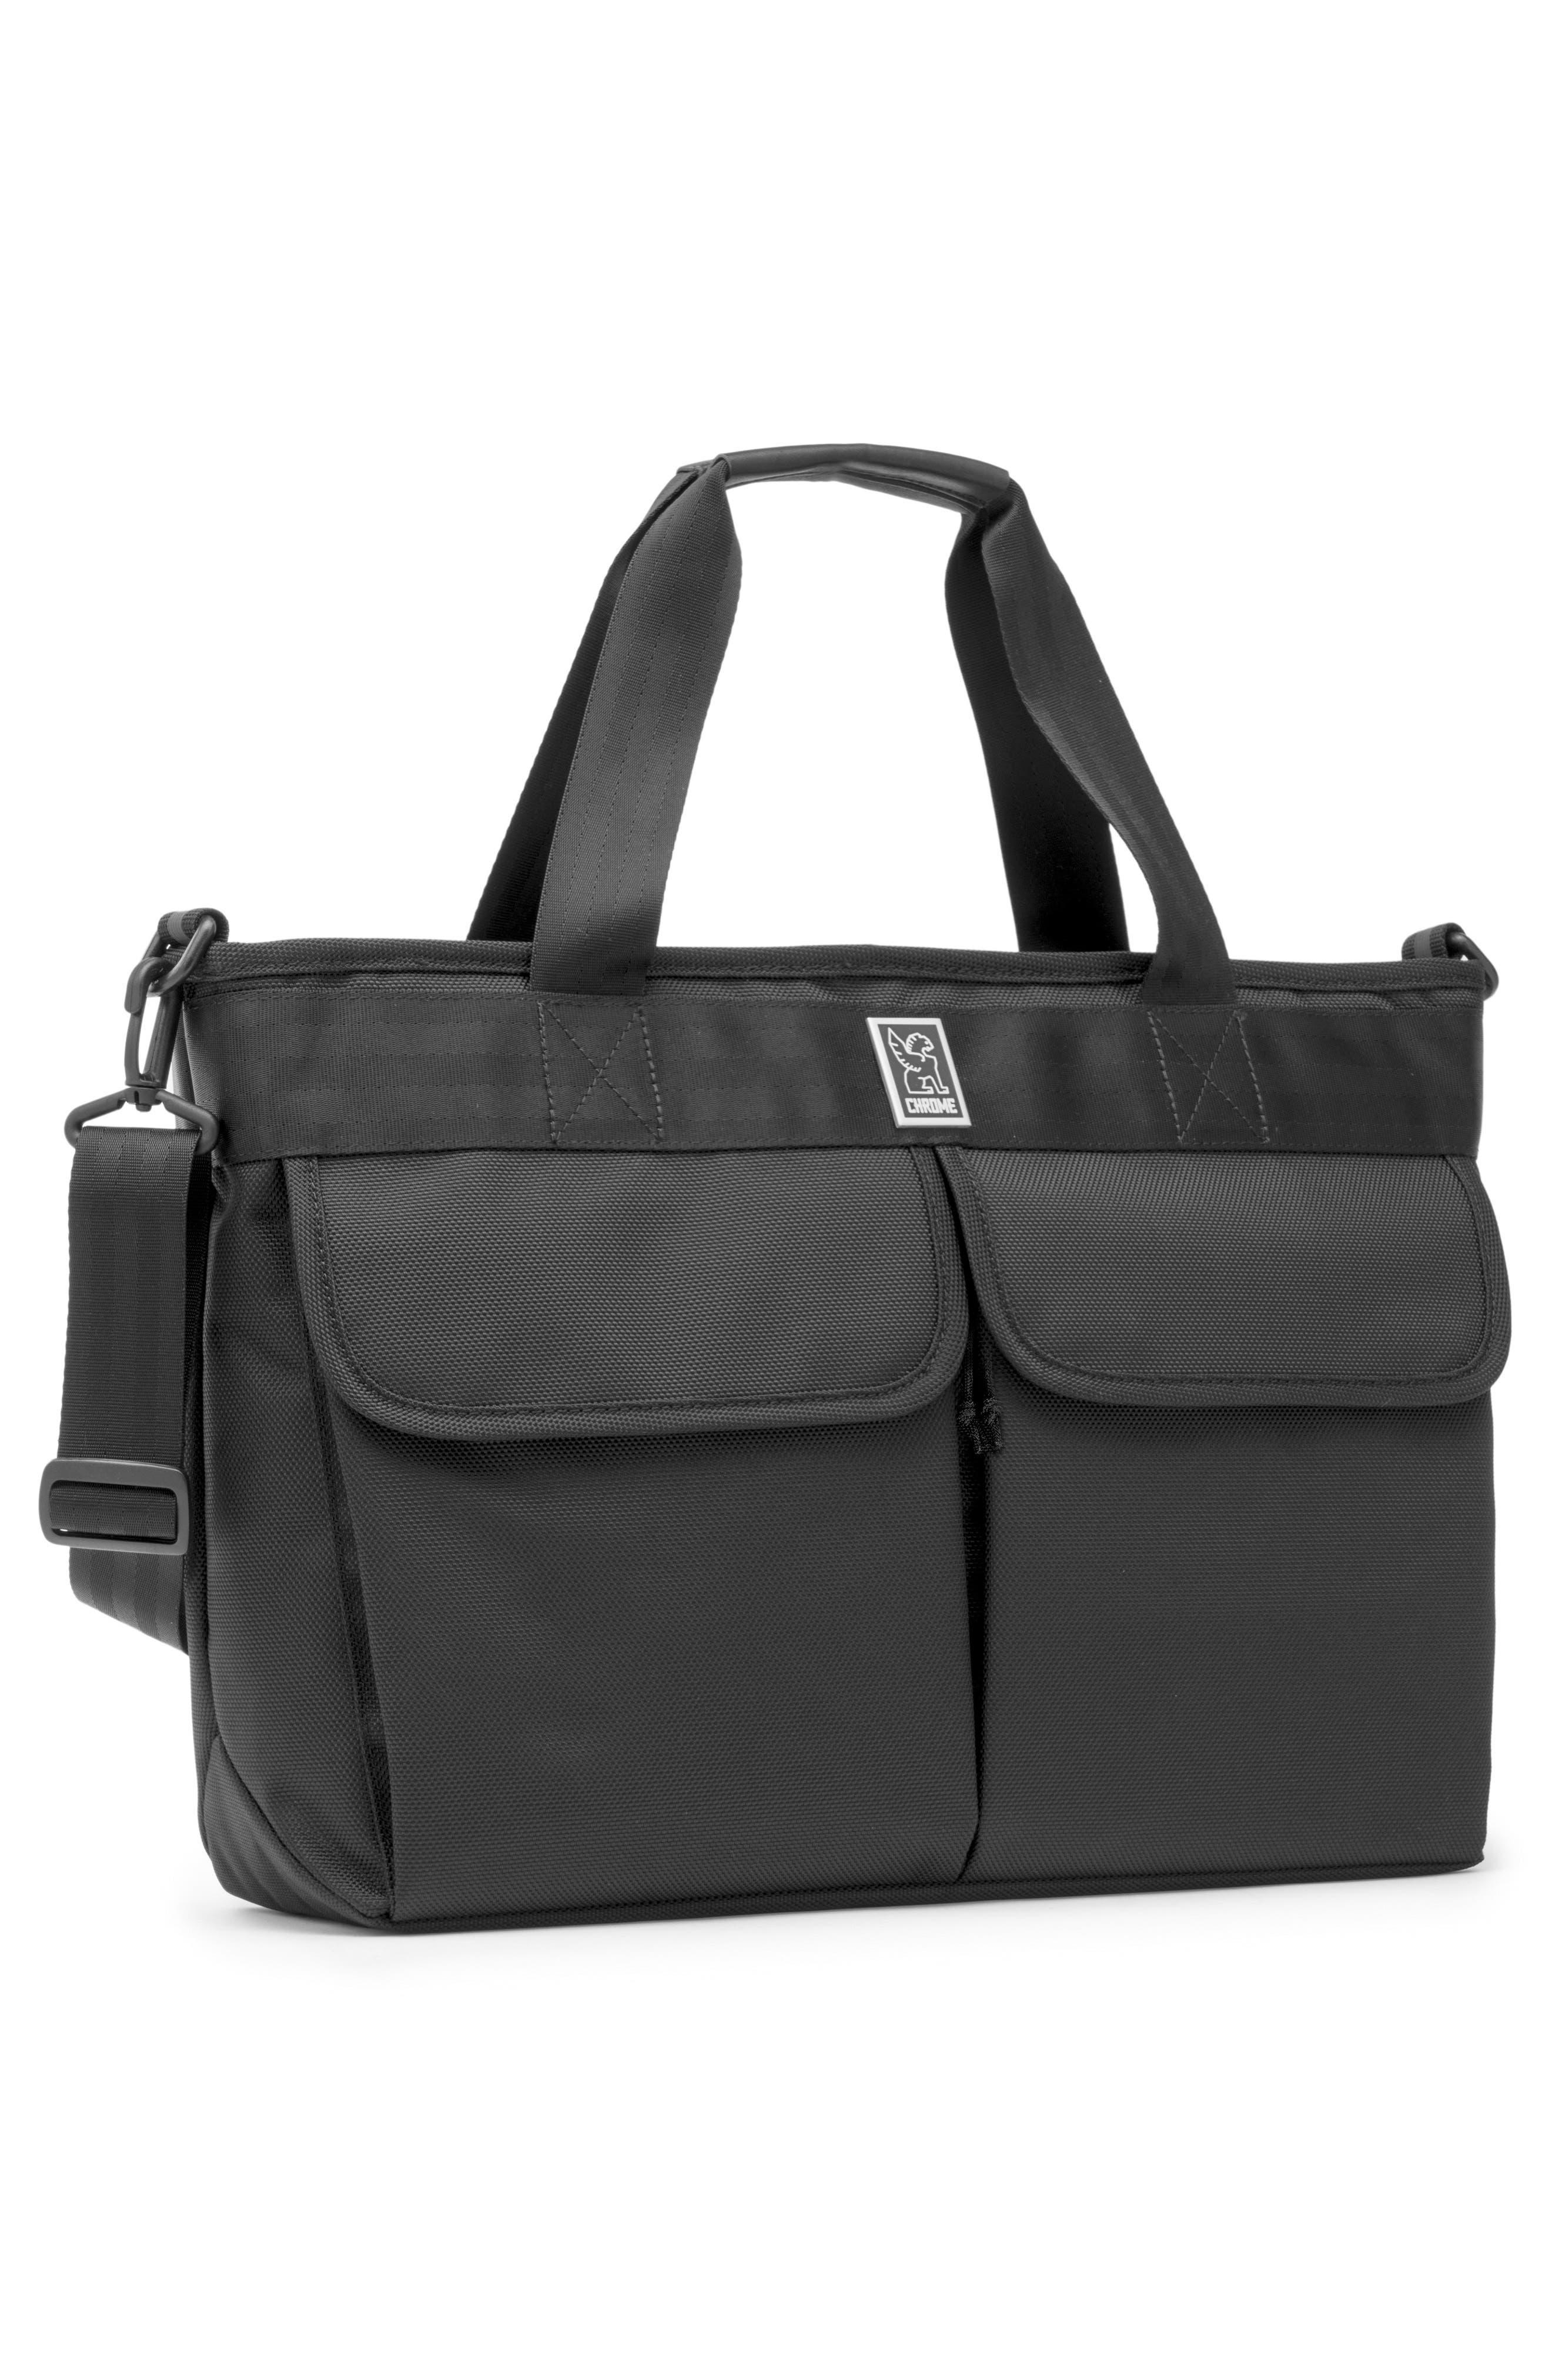 Juno Travel Tote Bag,                             Alternate thumbnail 4, color,                             All Black